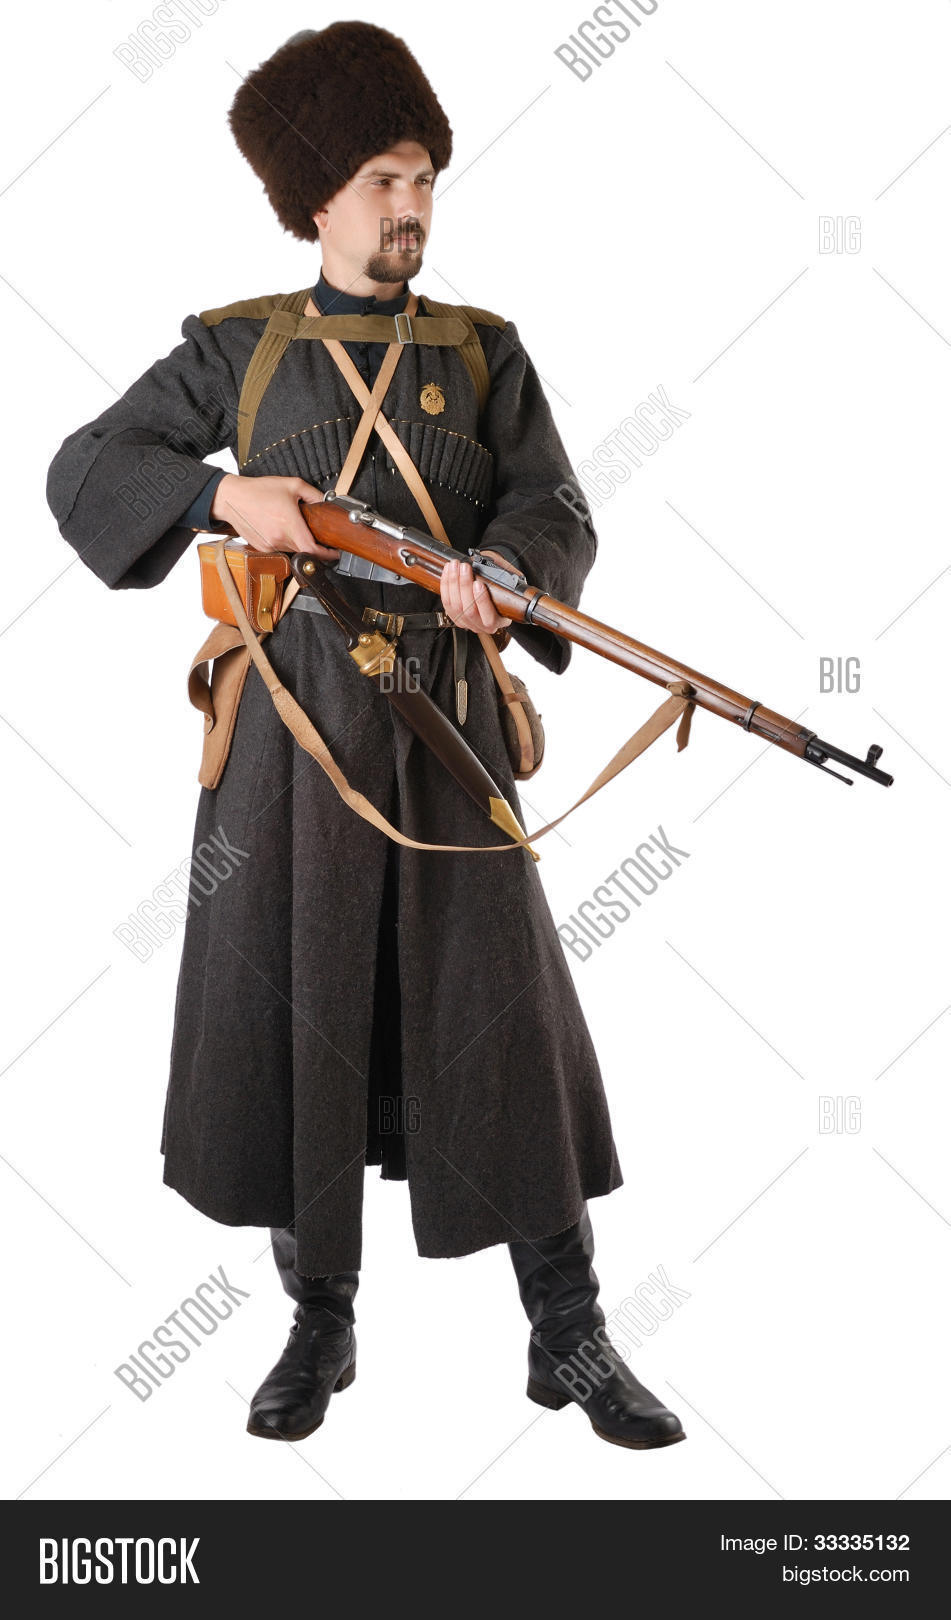 Костюм казака